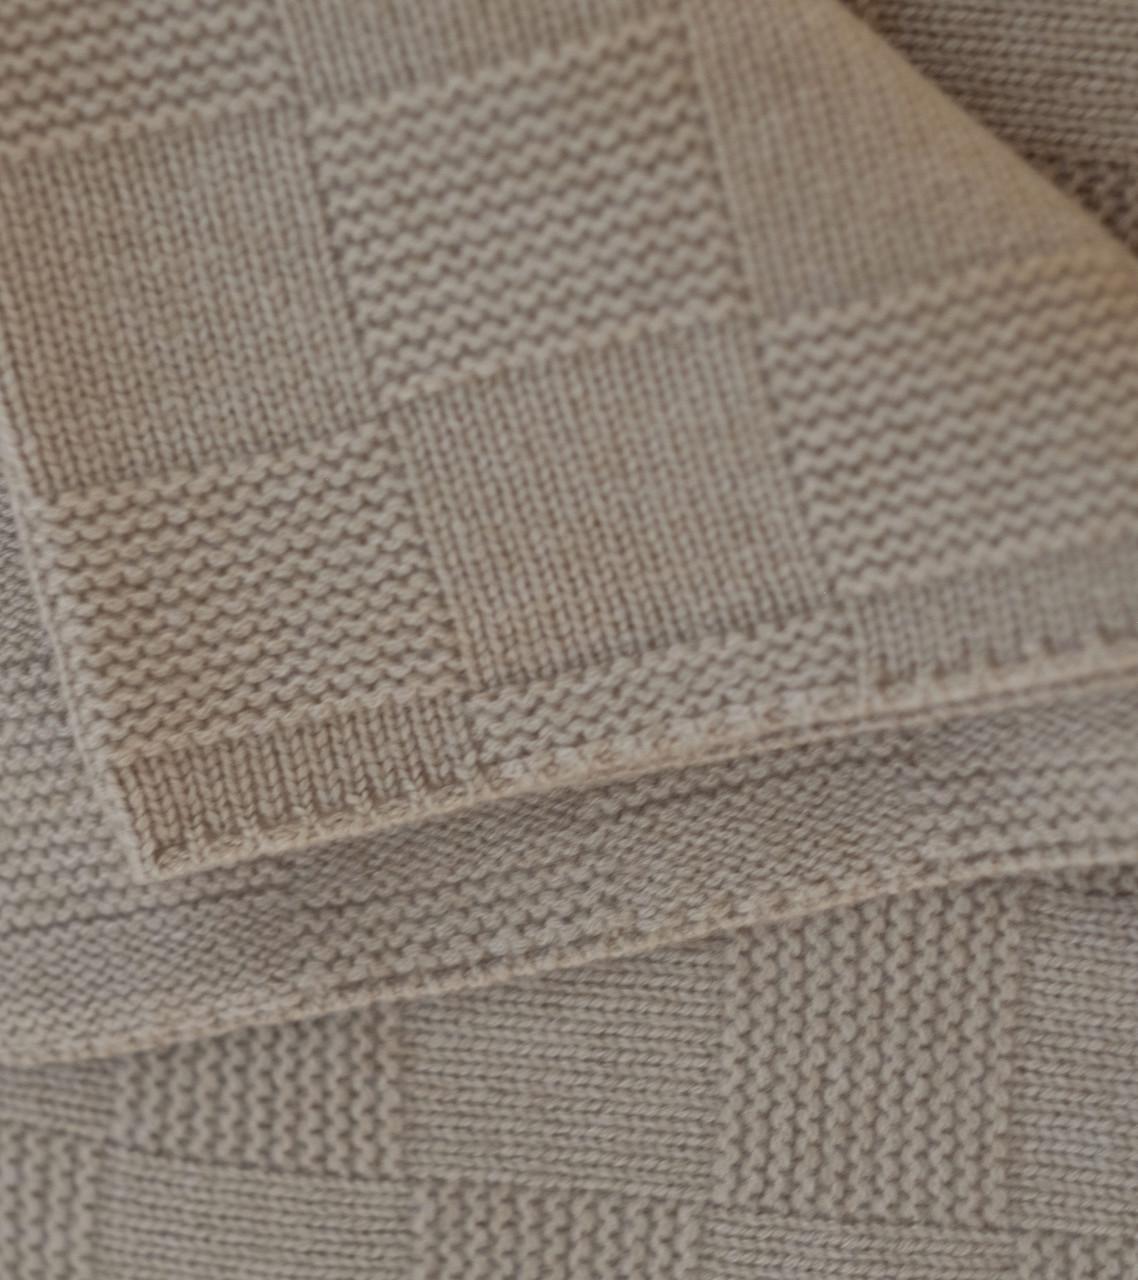 Tan Large Lattice Knit Cashmere Throw